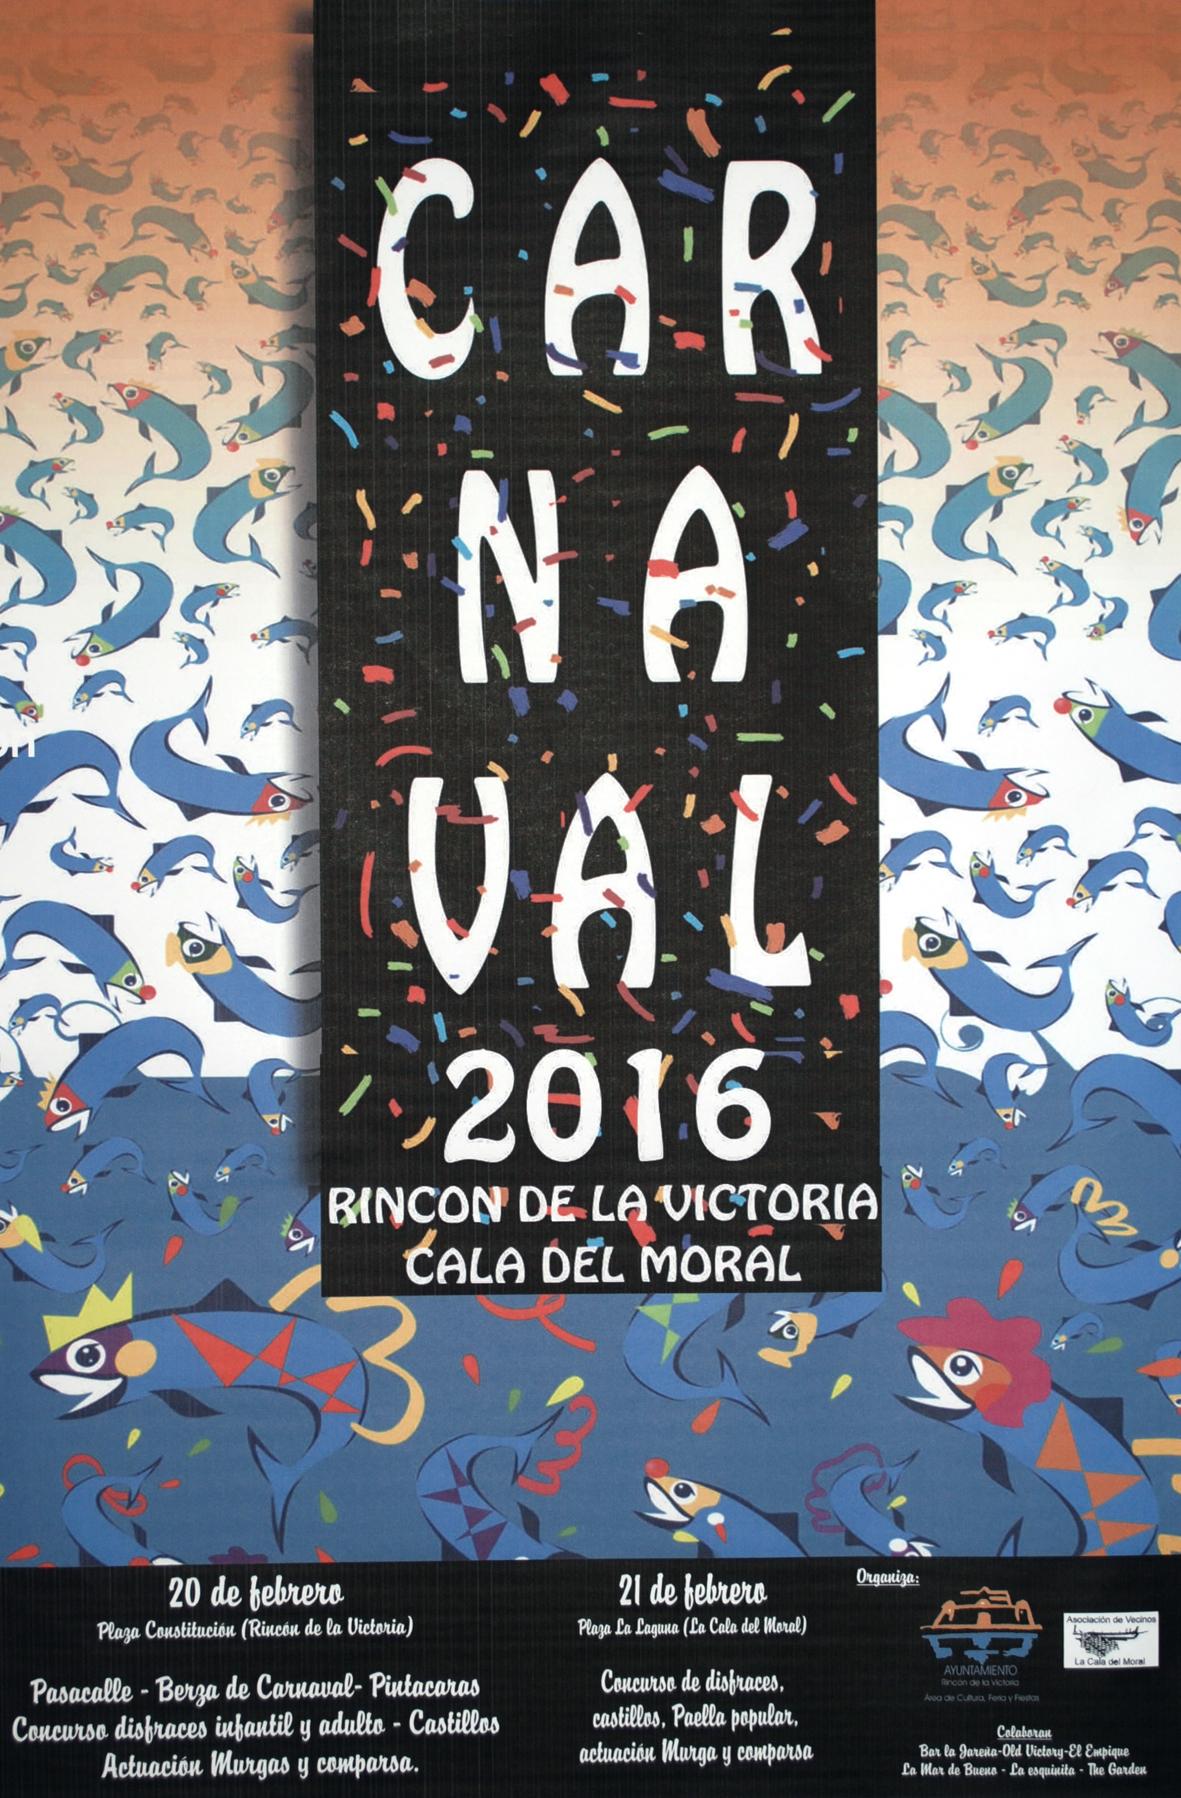 Arrinconados Carnaval